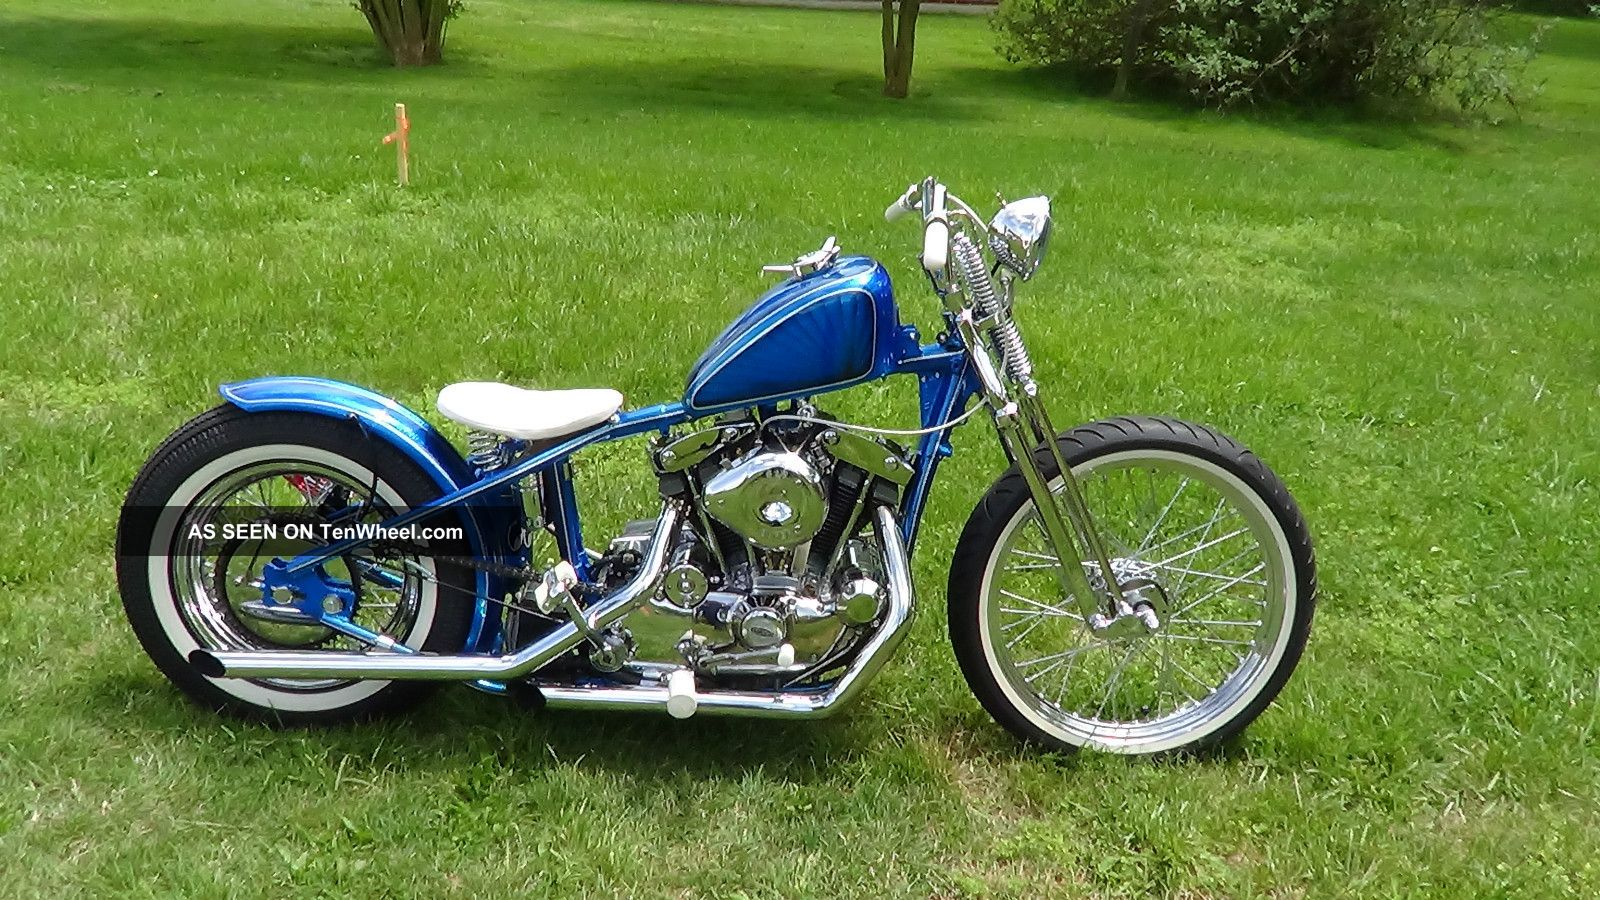 1973 Harley Davidson Ironhead Sportster Bobber Chopper Metalflake Kandy 1000cc Sportster photo